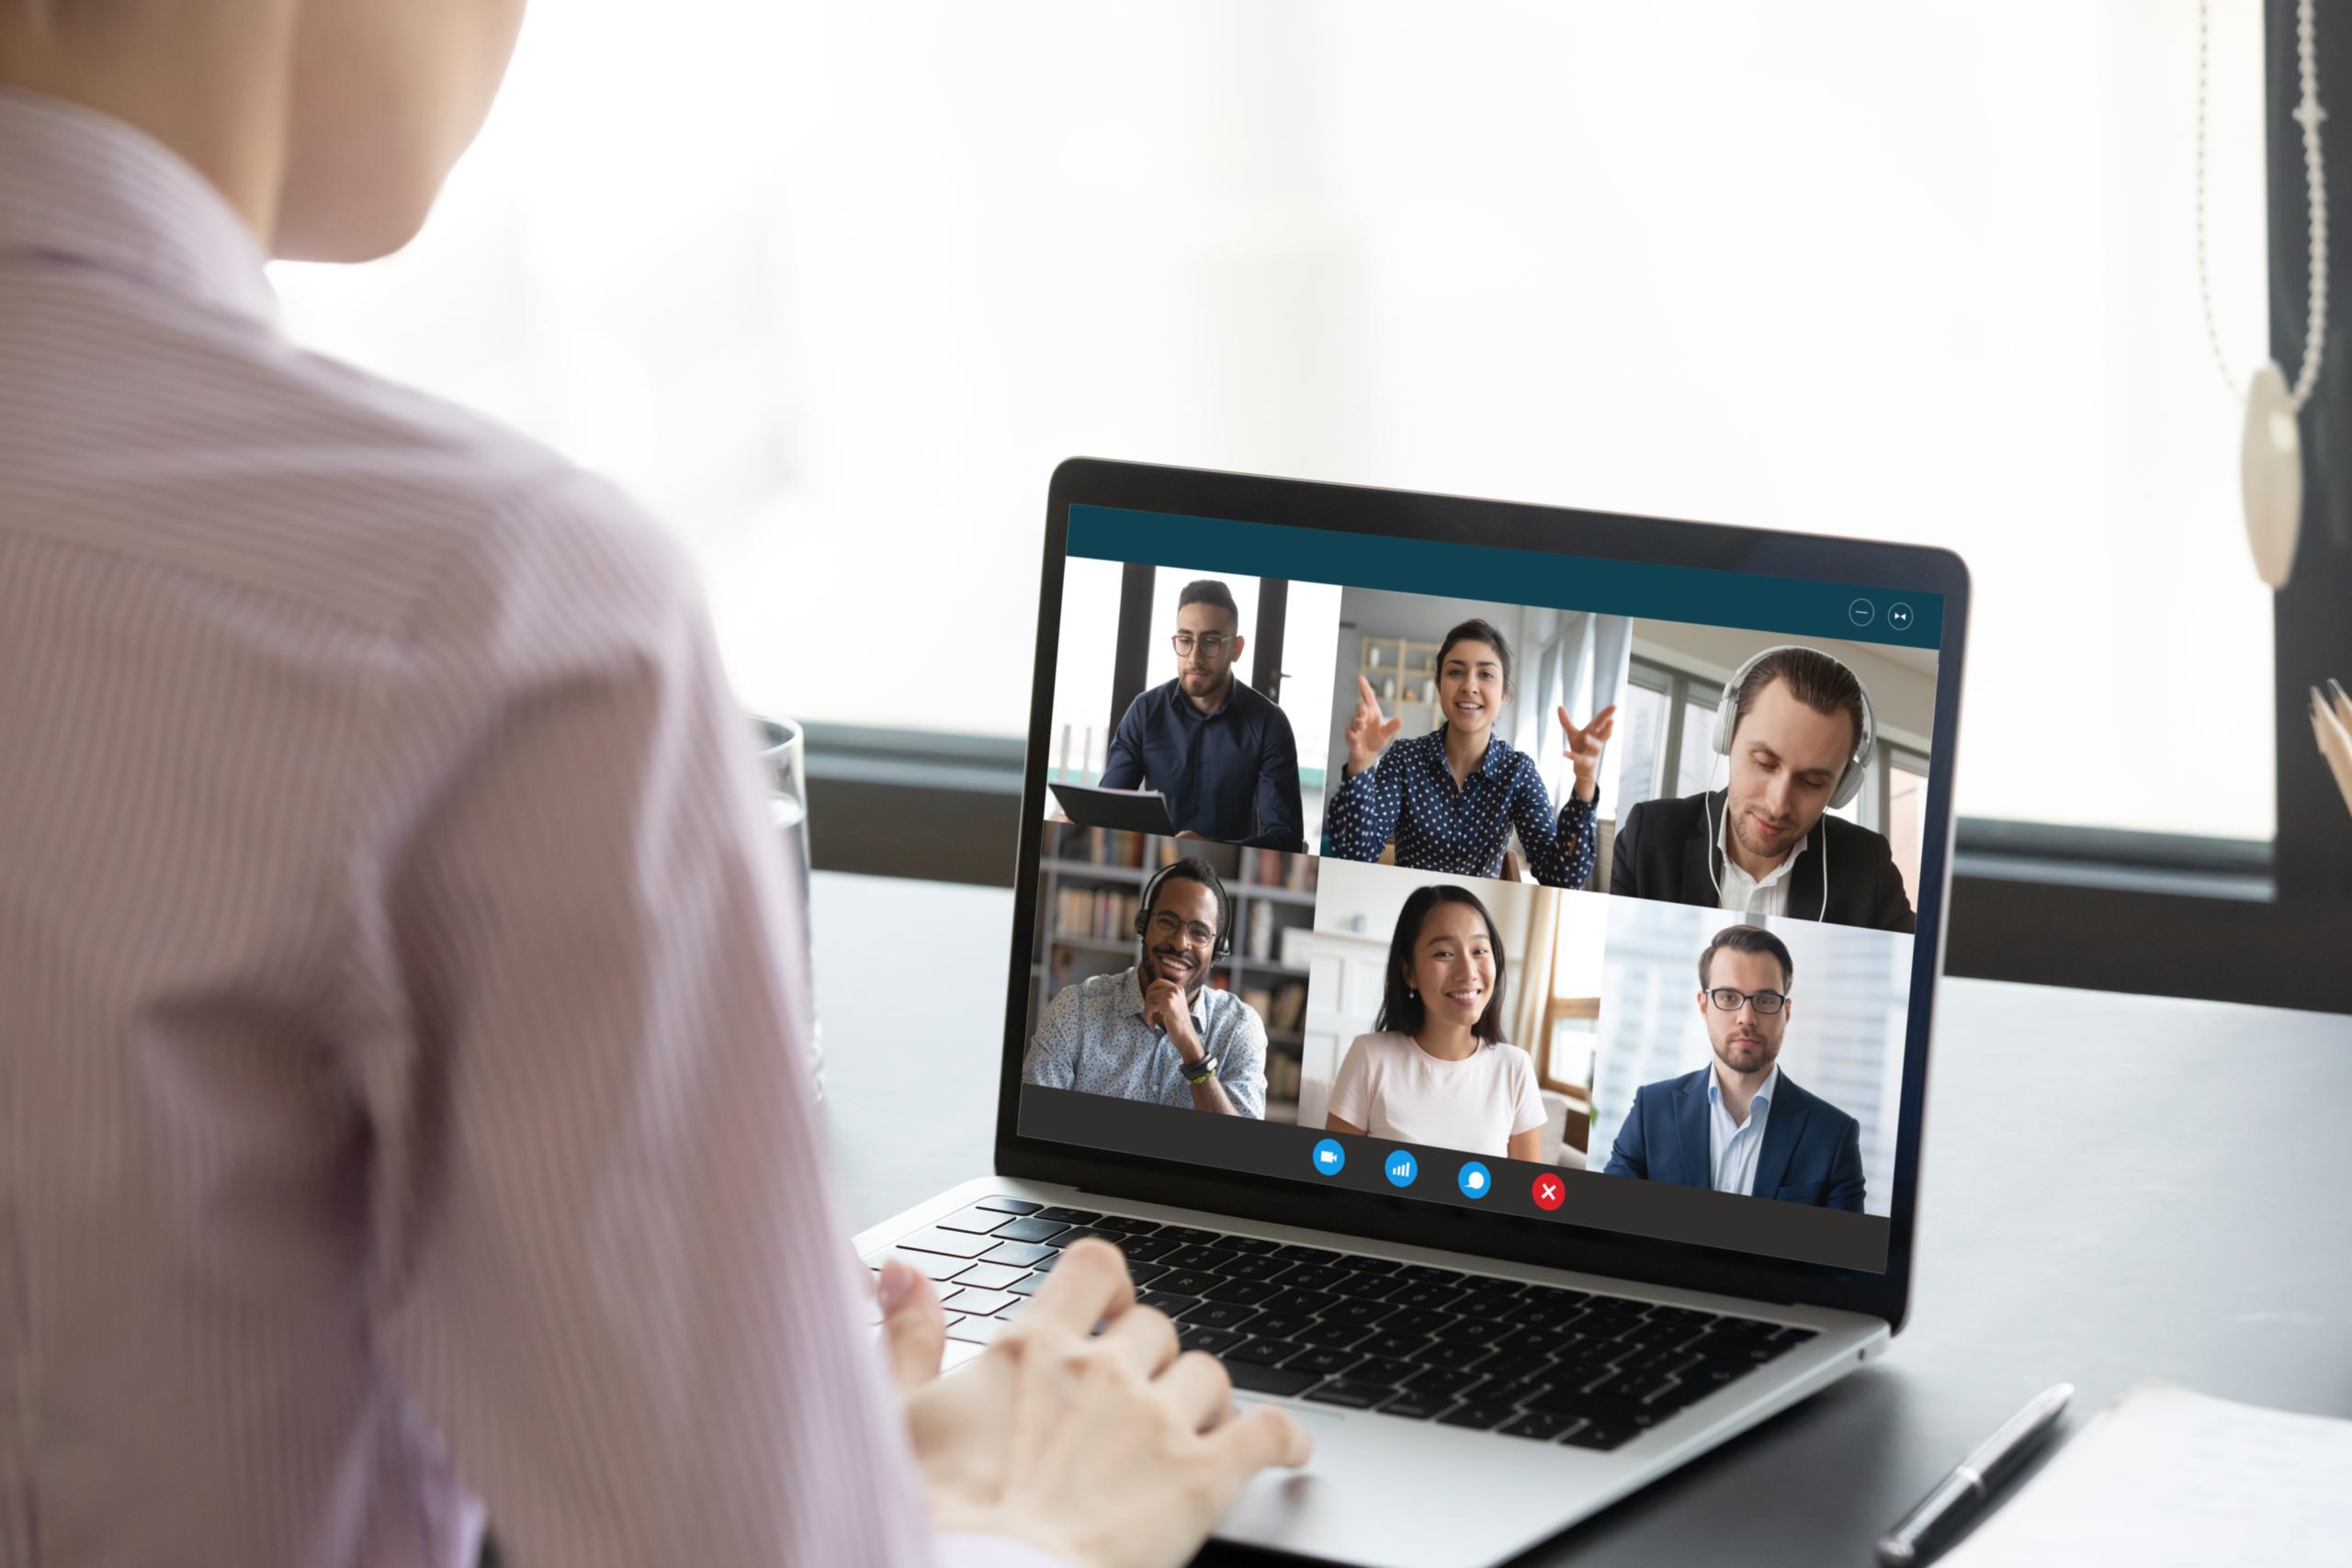 online teamplannen maken